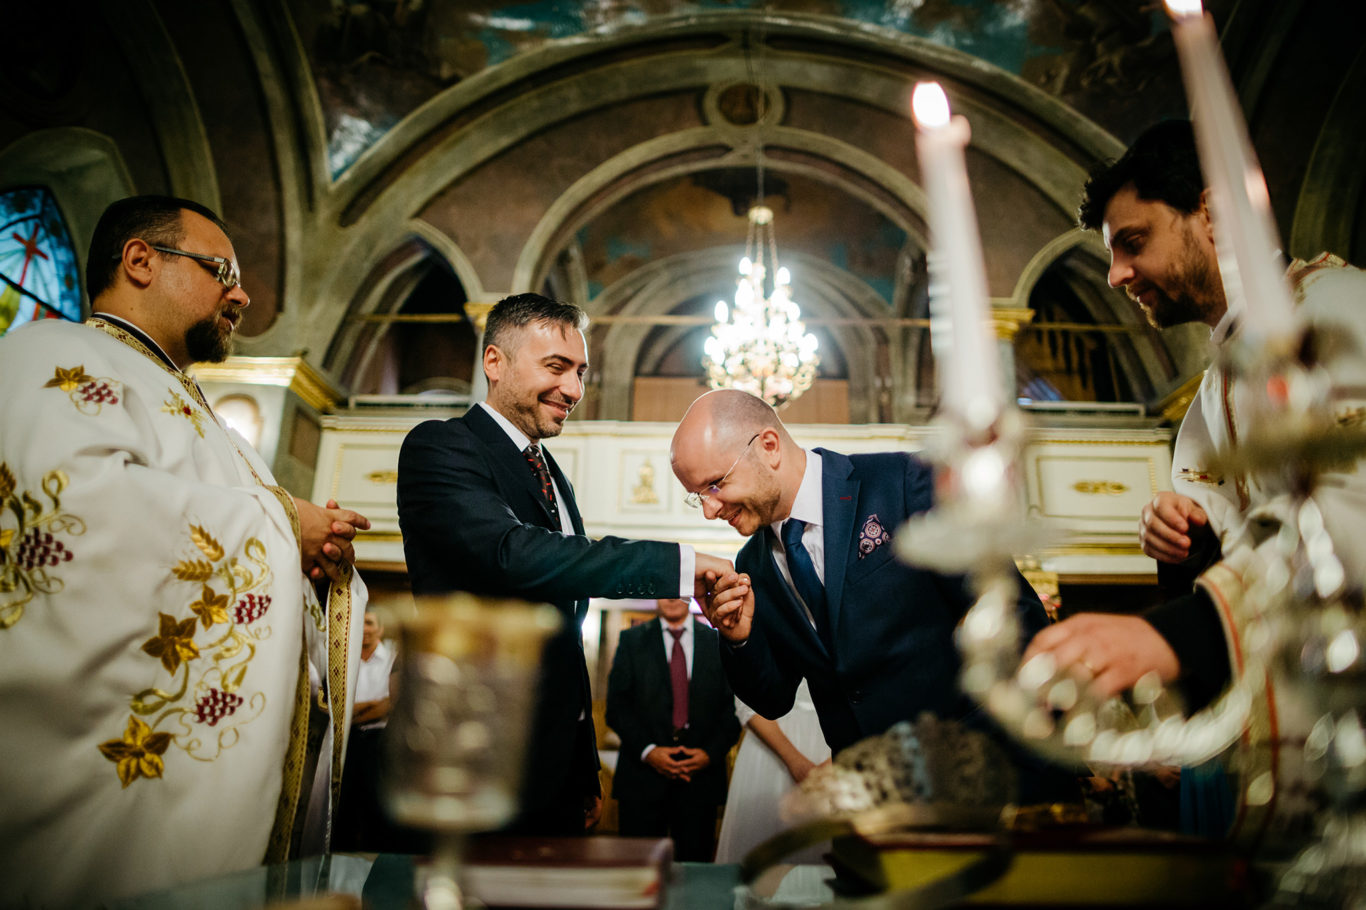 0423-fotografie-nunta-bucuresti-anca-george-fotograf-ciprian-dumitrescu-cdf_0182-3